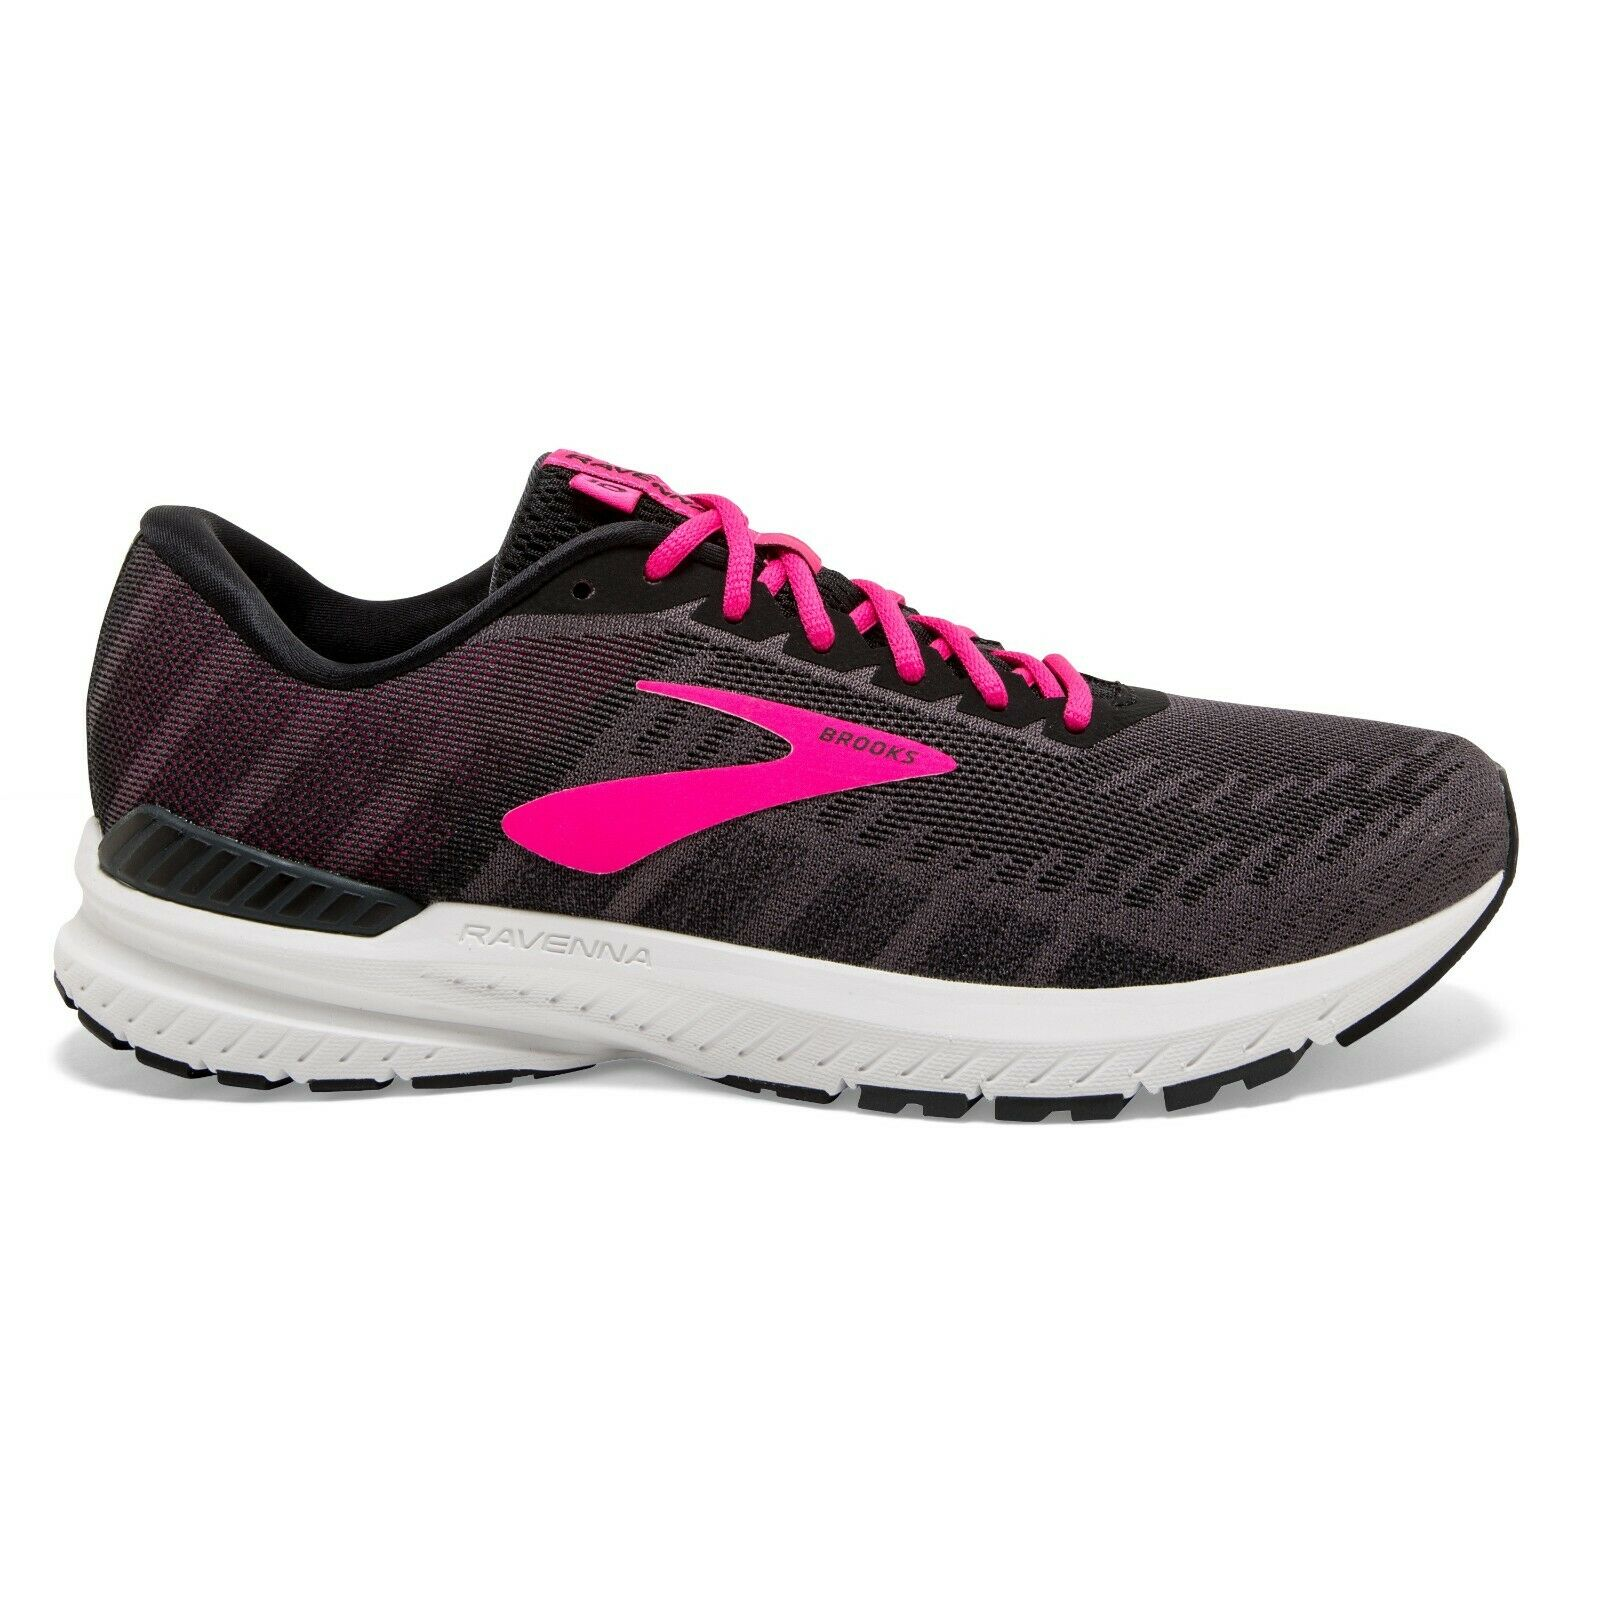 GRANDE SALVAZIONIBrooks Ravenna 10 donna Running scarpe (B) (077)   edizione limitata a caldo